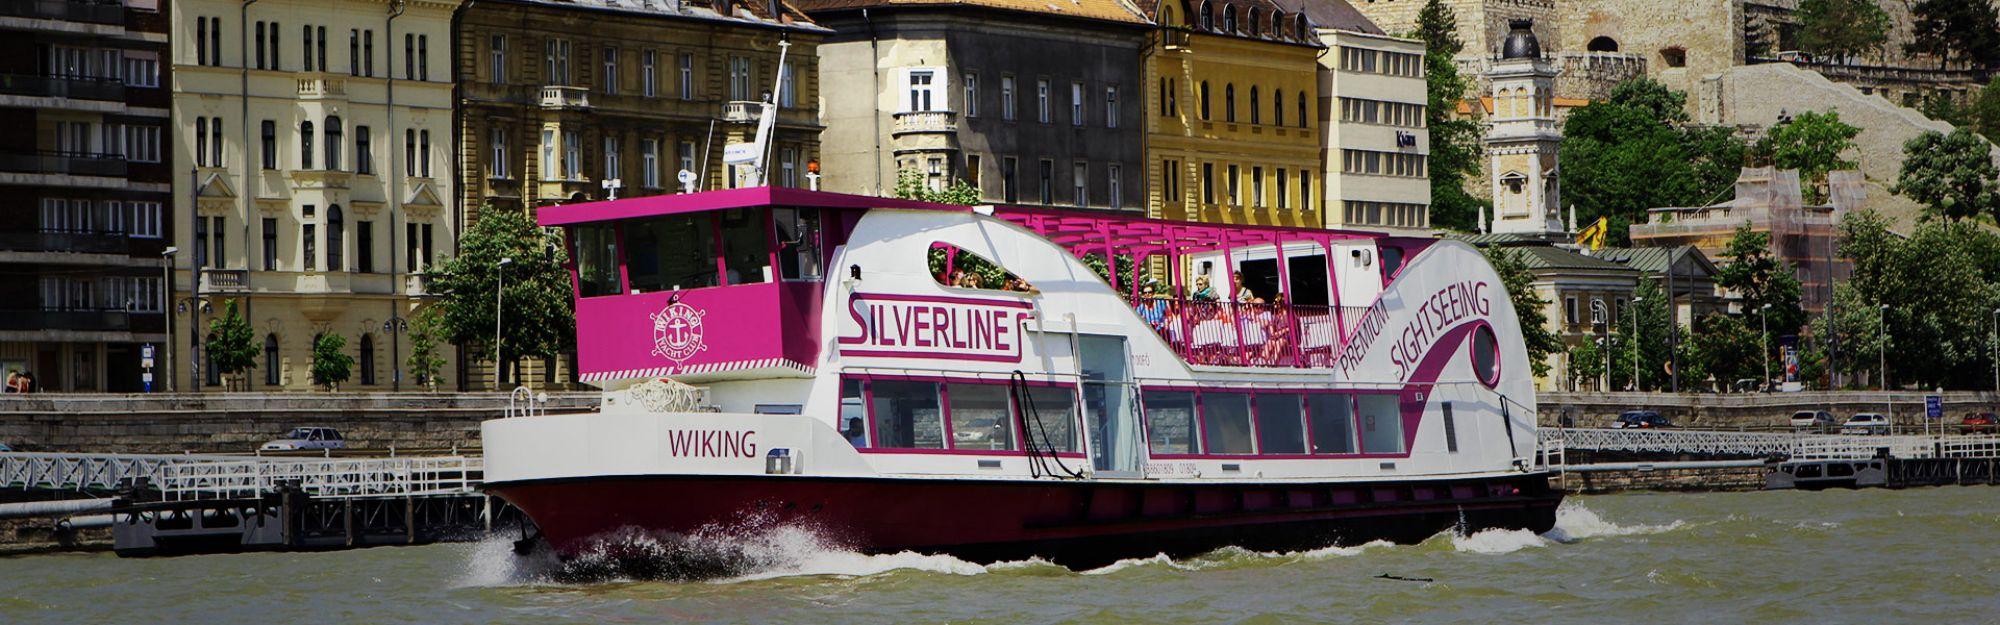 Budapest Silverline Cruises